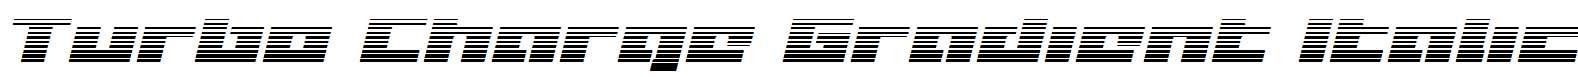 Turbo-Charge-Gradient-Italic